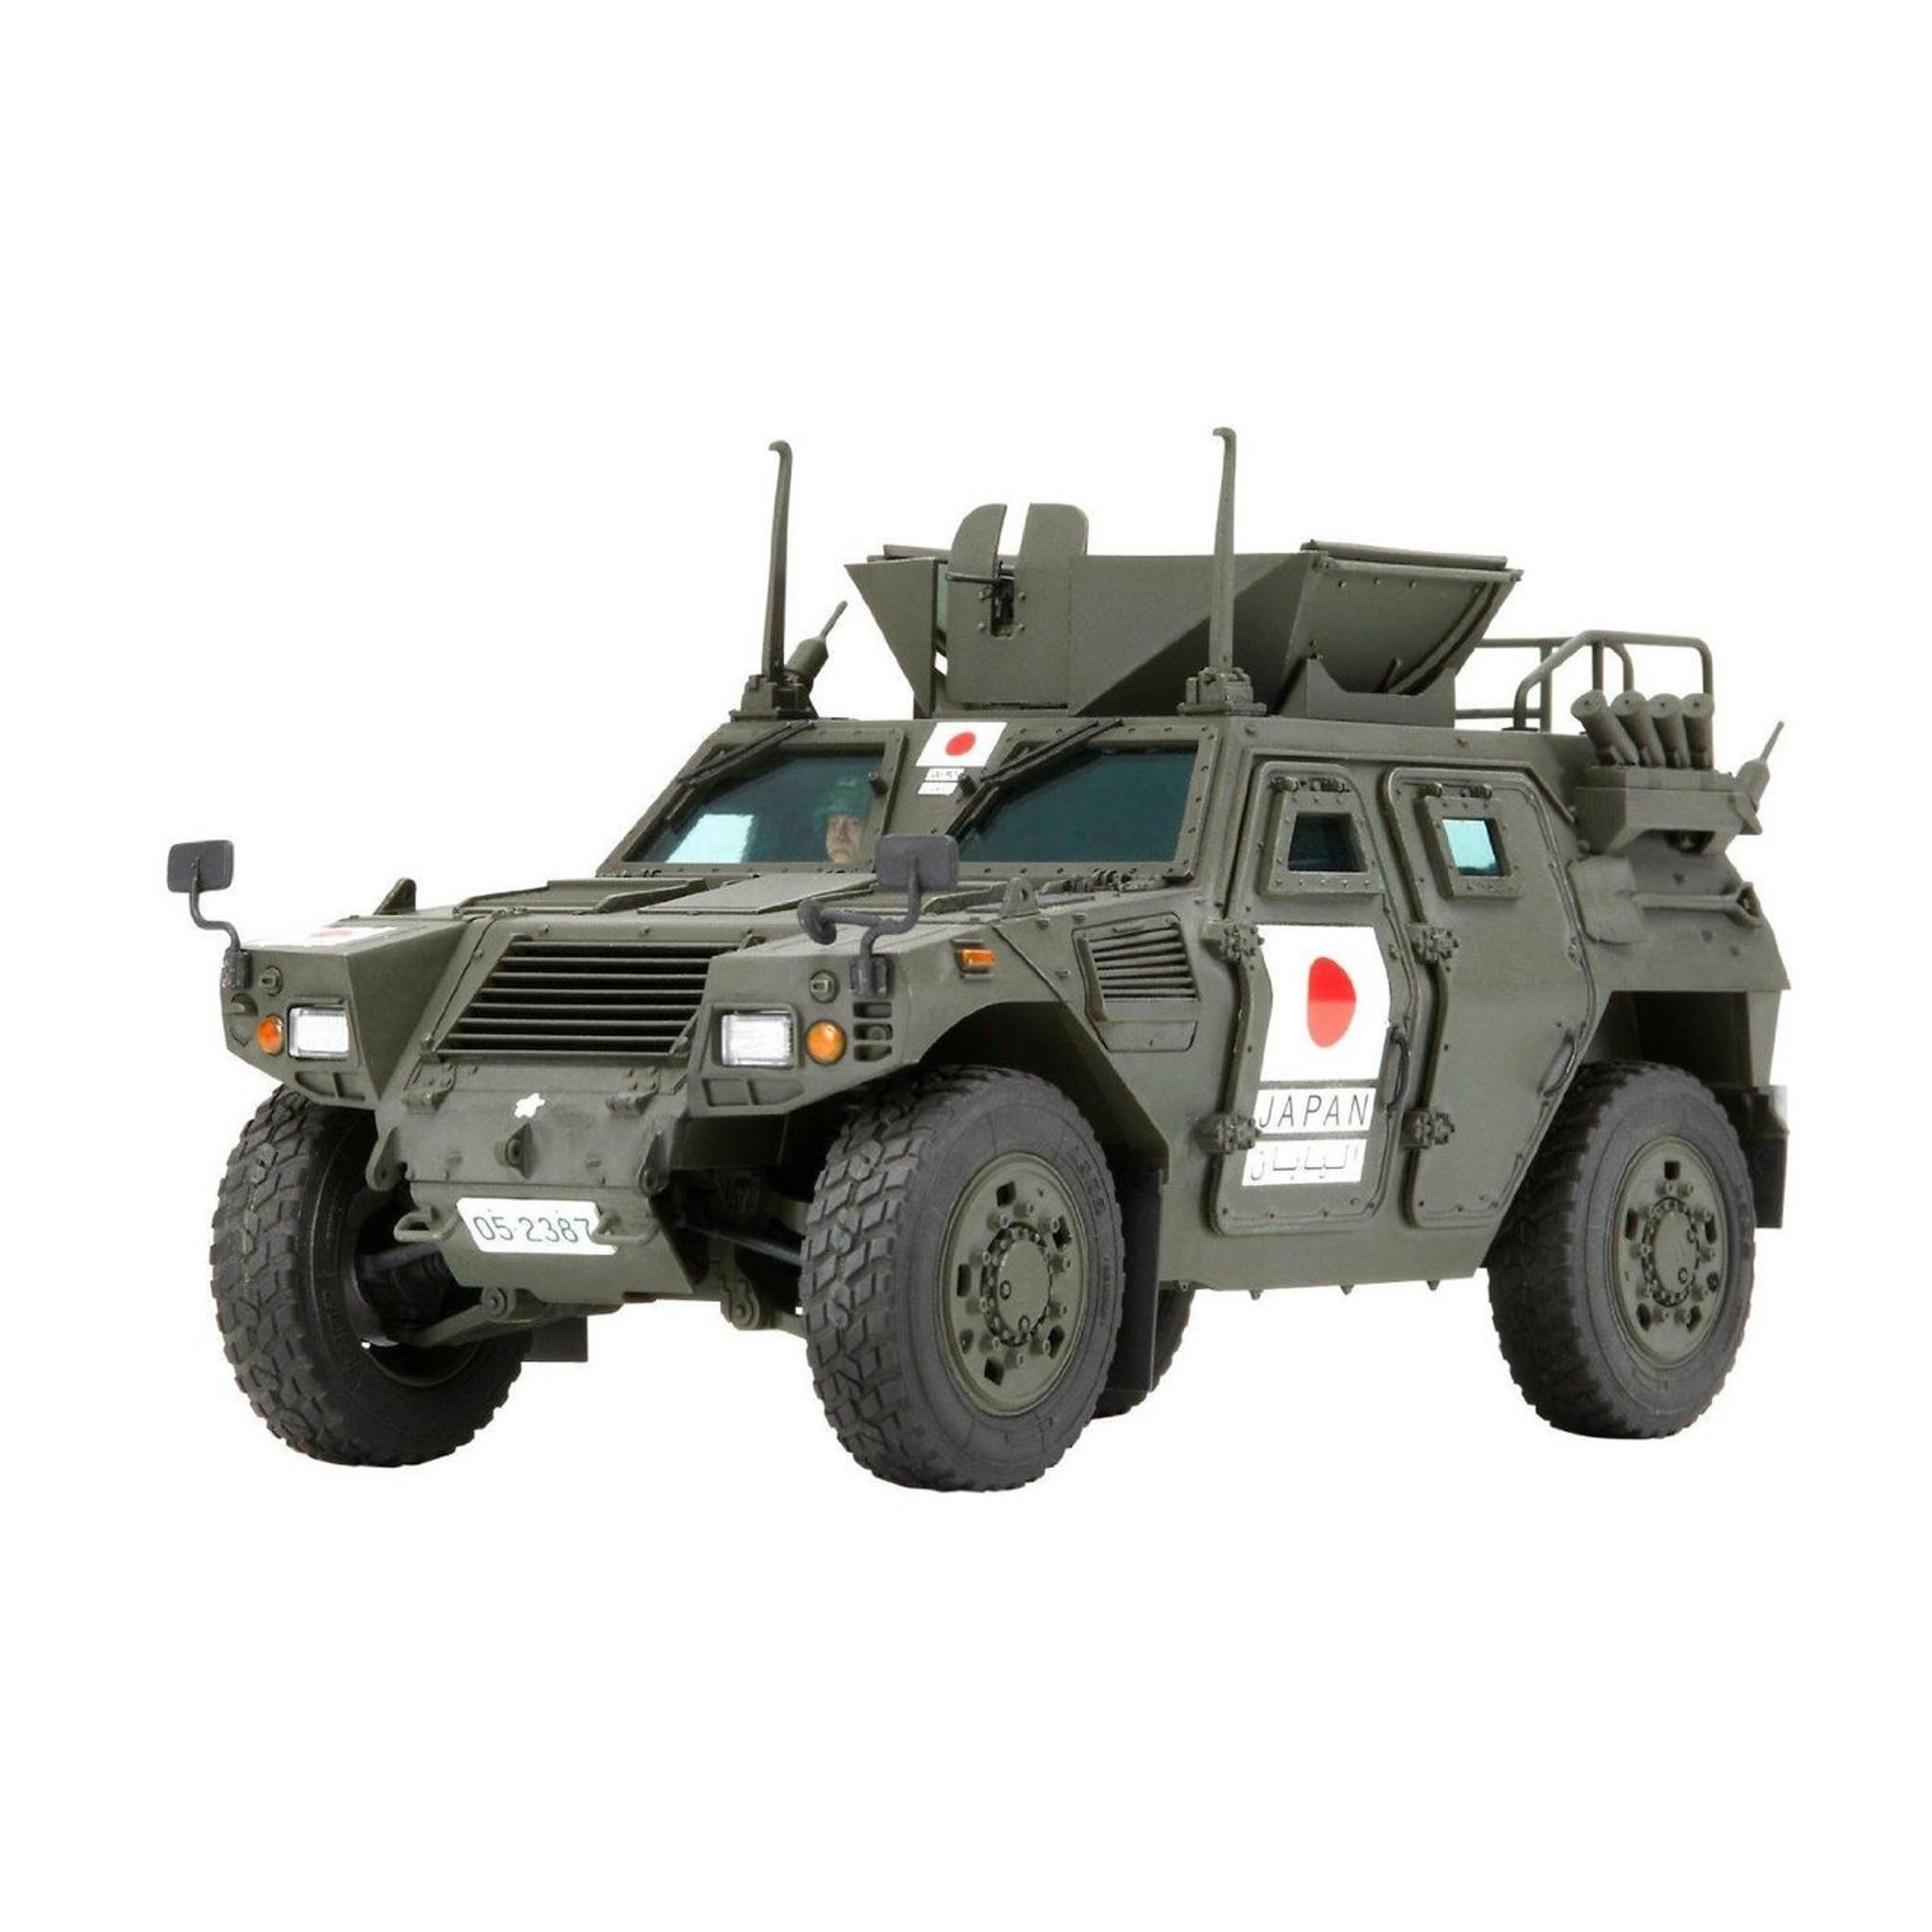 Tamiya 35275 JGSDF Light Armored Vehicle (Iraq Assistance Unit) 1/35 Scale  Kit ...